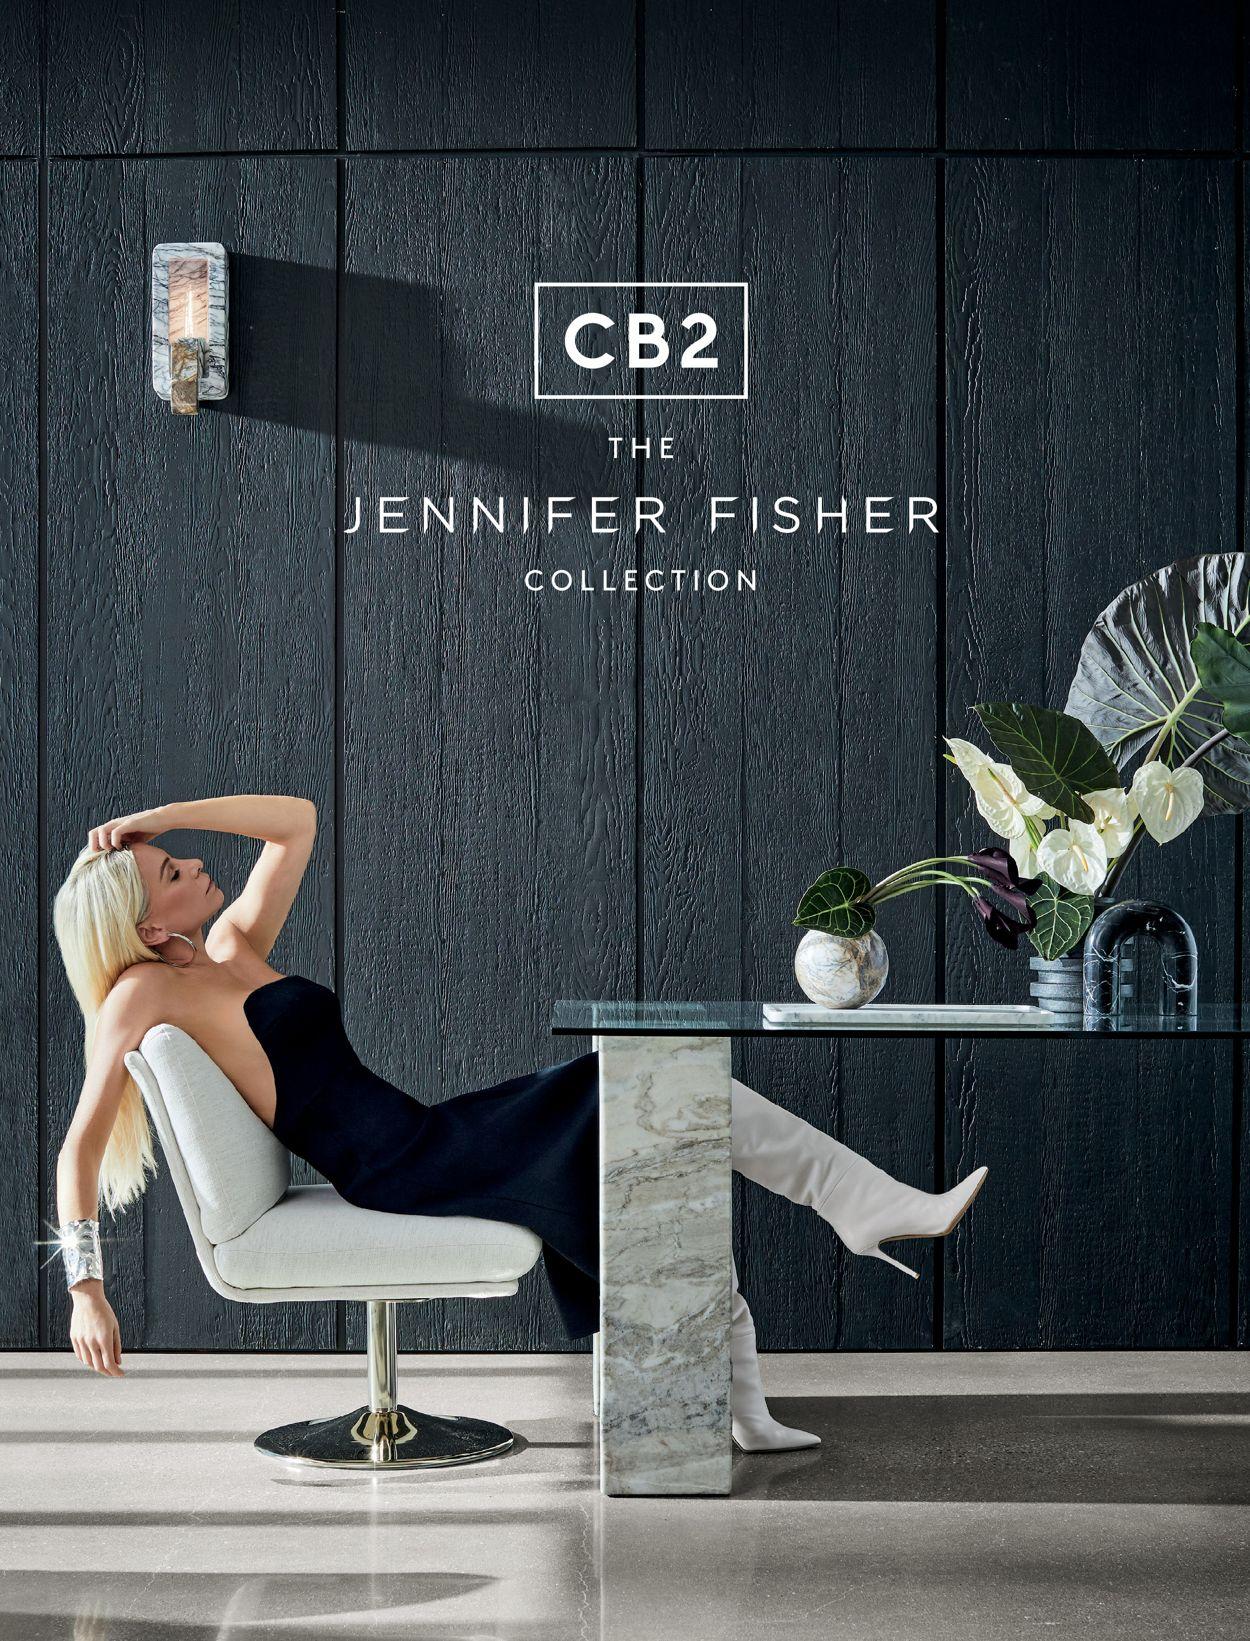 Catalogue CB2 from 02/25/2020